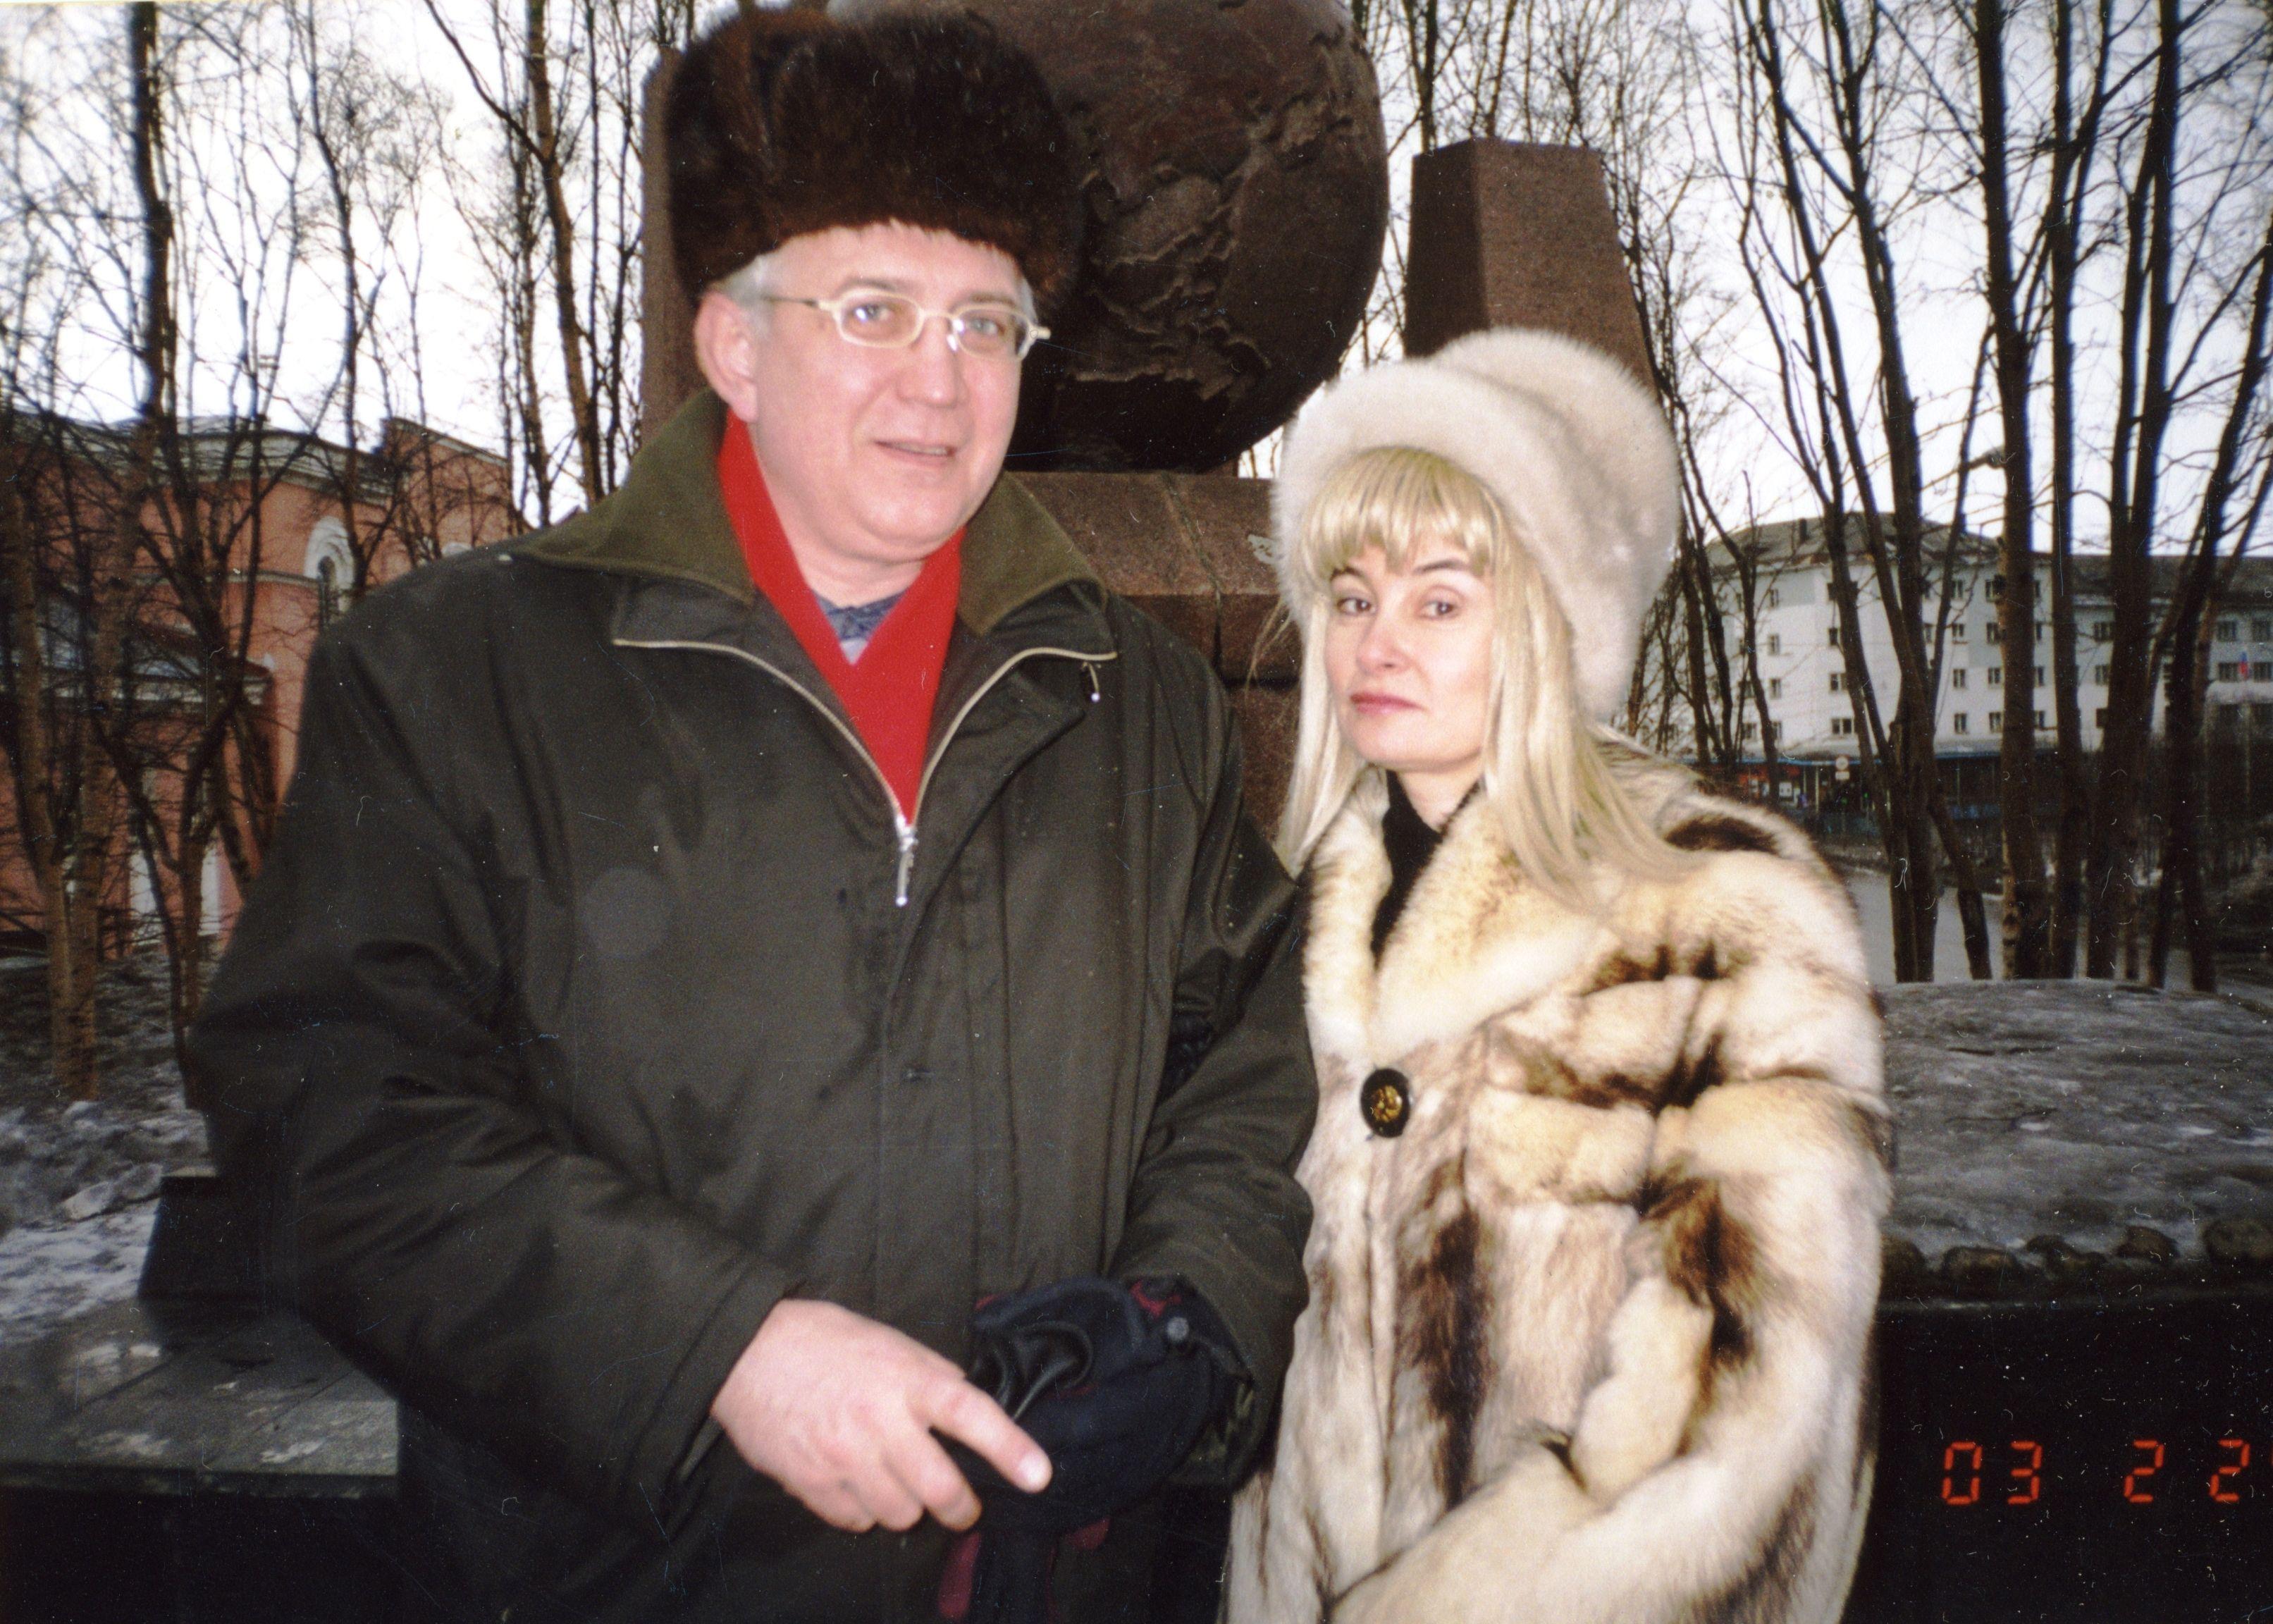 Мурманск, 2003, обелиск англо-штатовским морским конвоям 1943-1945 годов